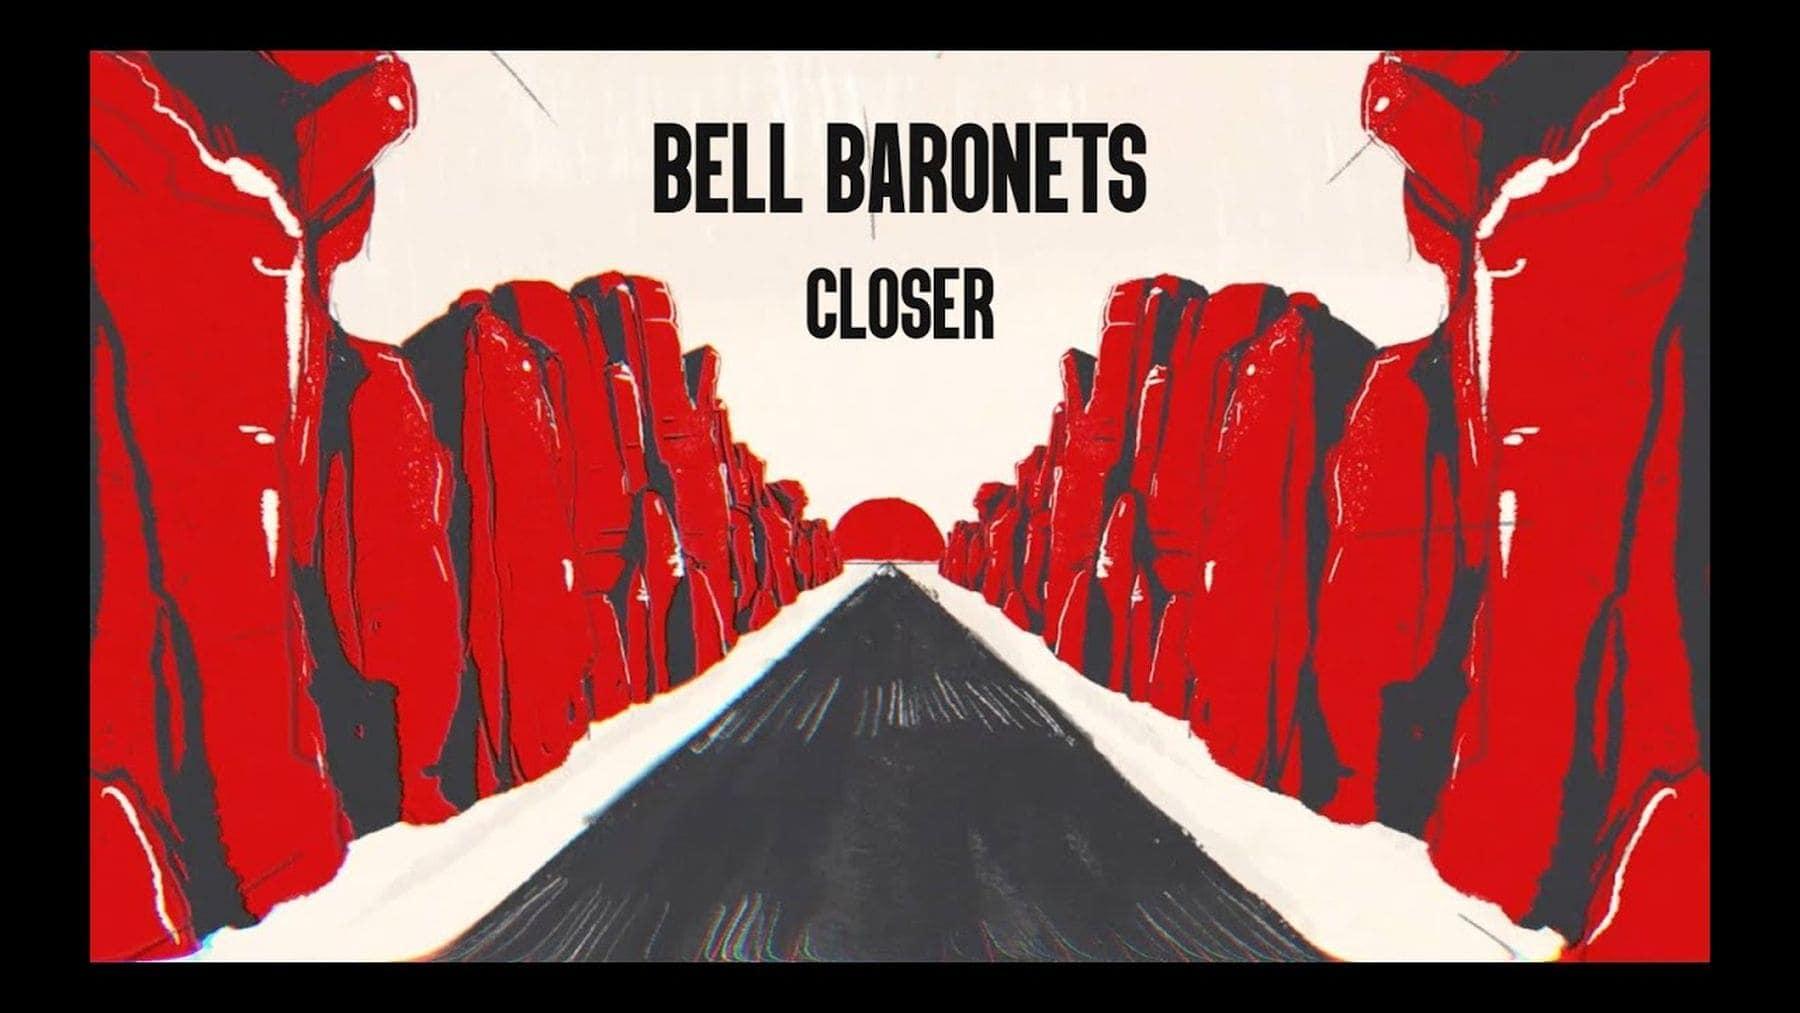 Bell Baronets - Closer | Musik | Was is hier eigentlich los?